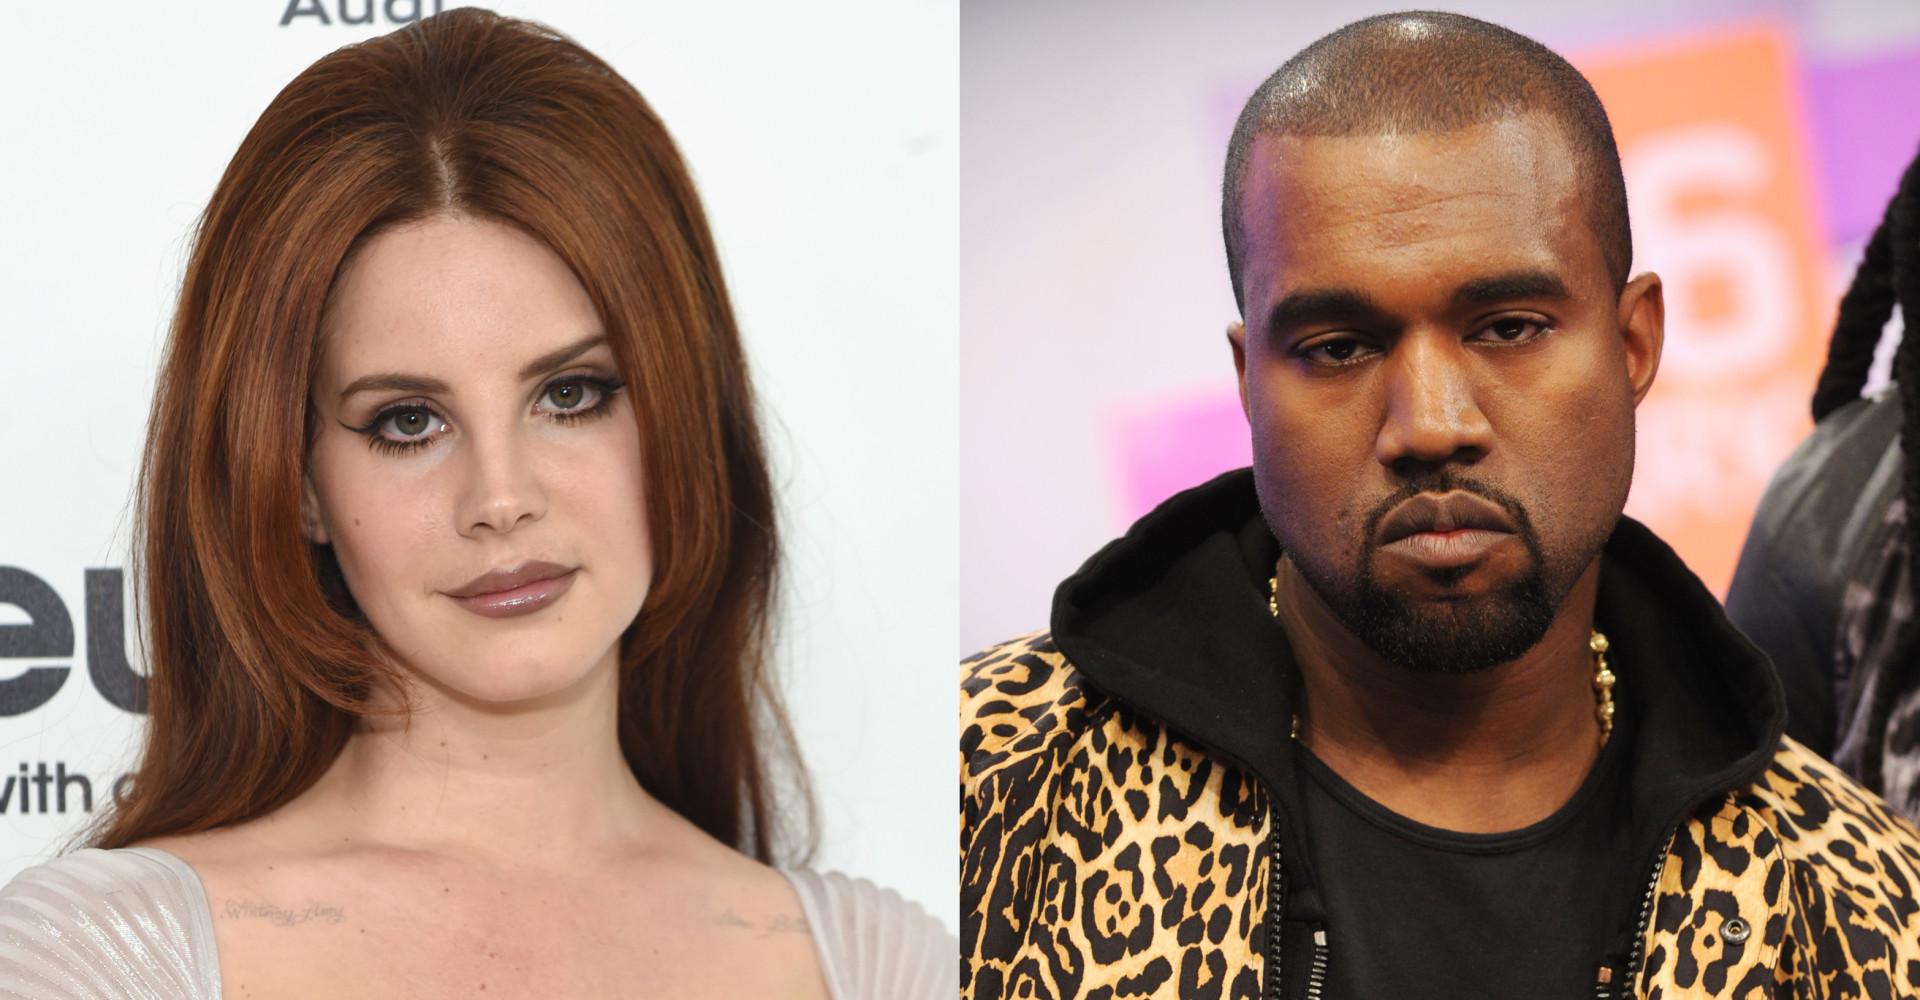 Lana Del Rey si scaglia contro Kanye West